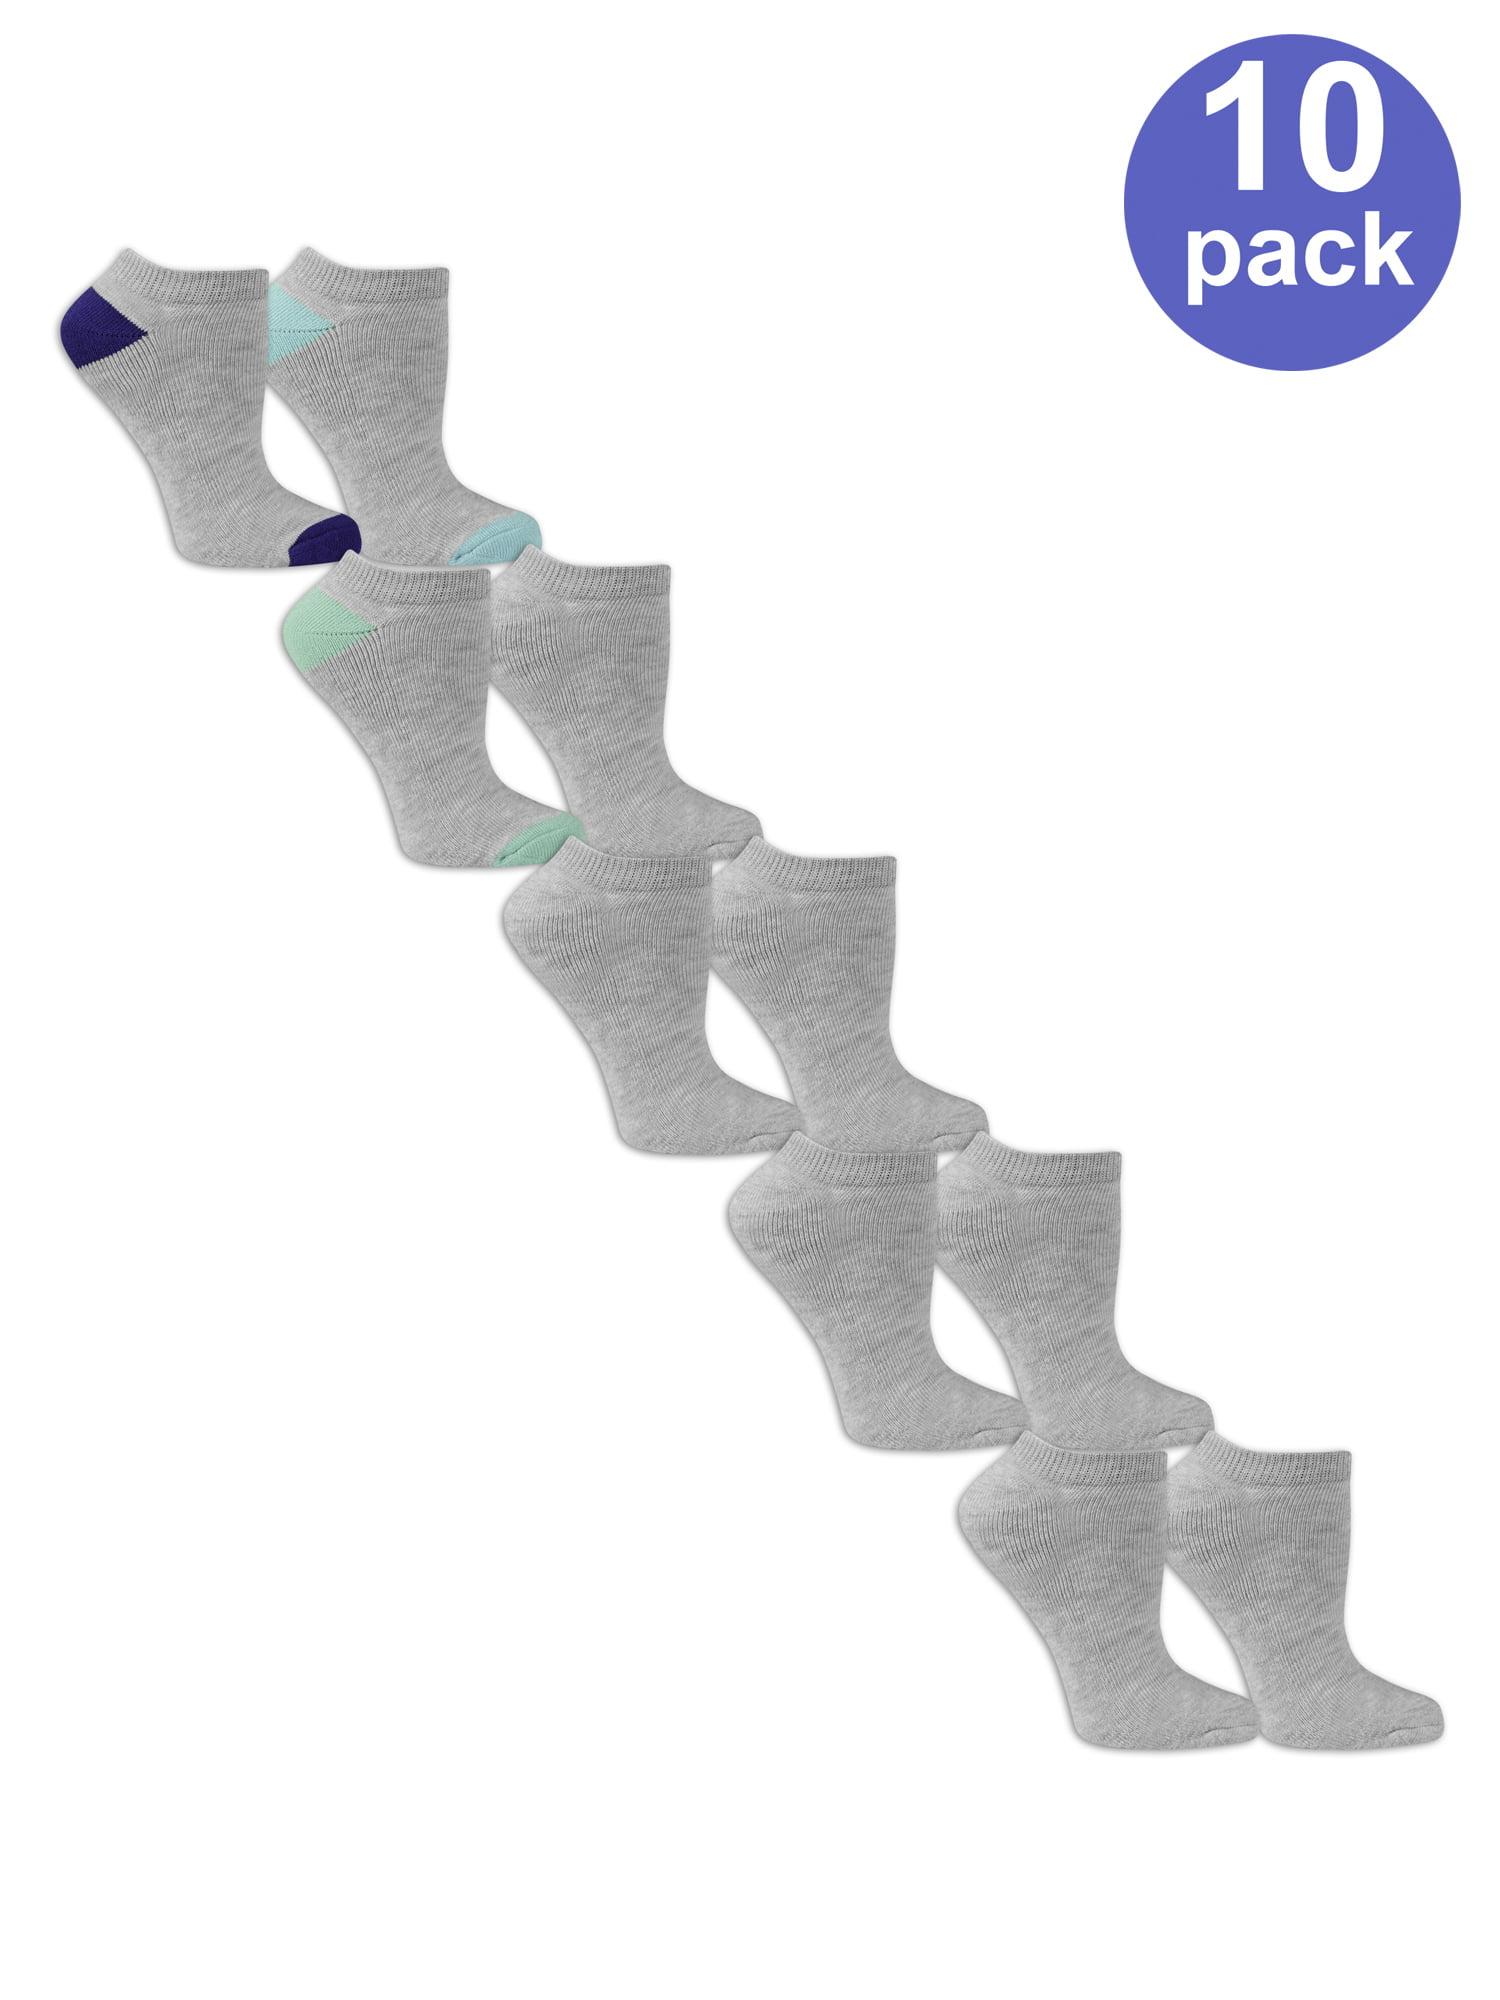 Ladies Half Cushion No Show Socks, 10 Pair